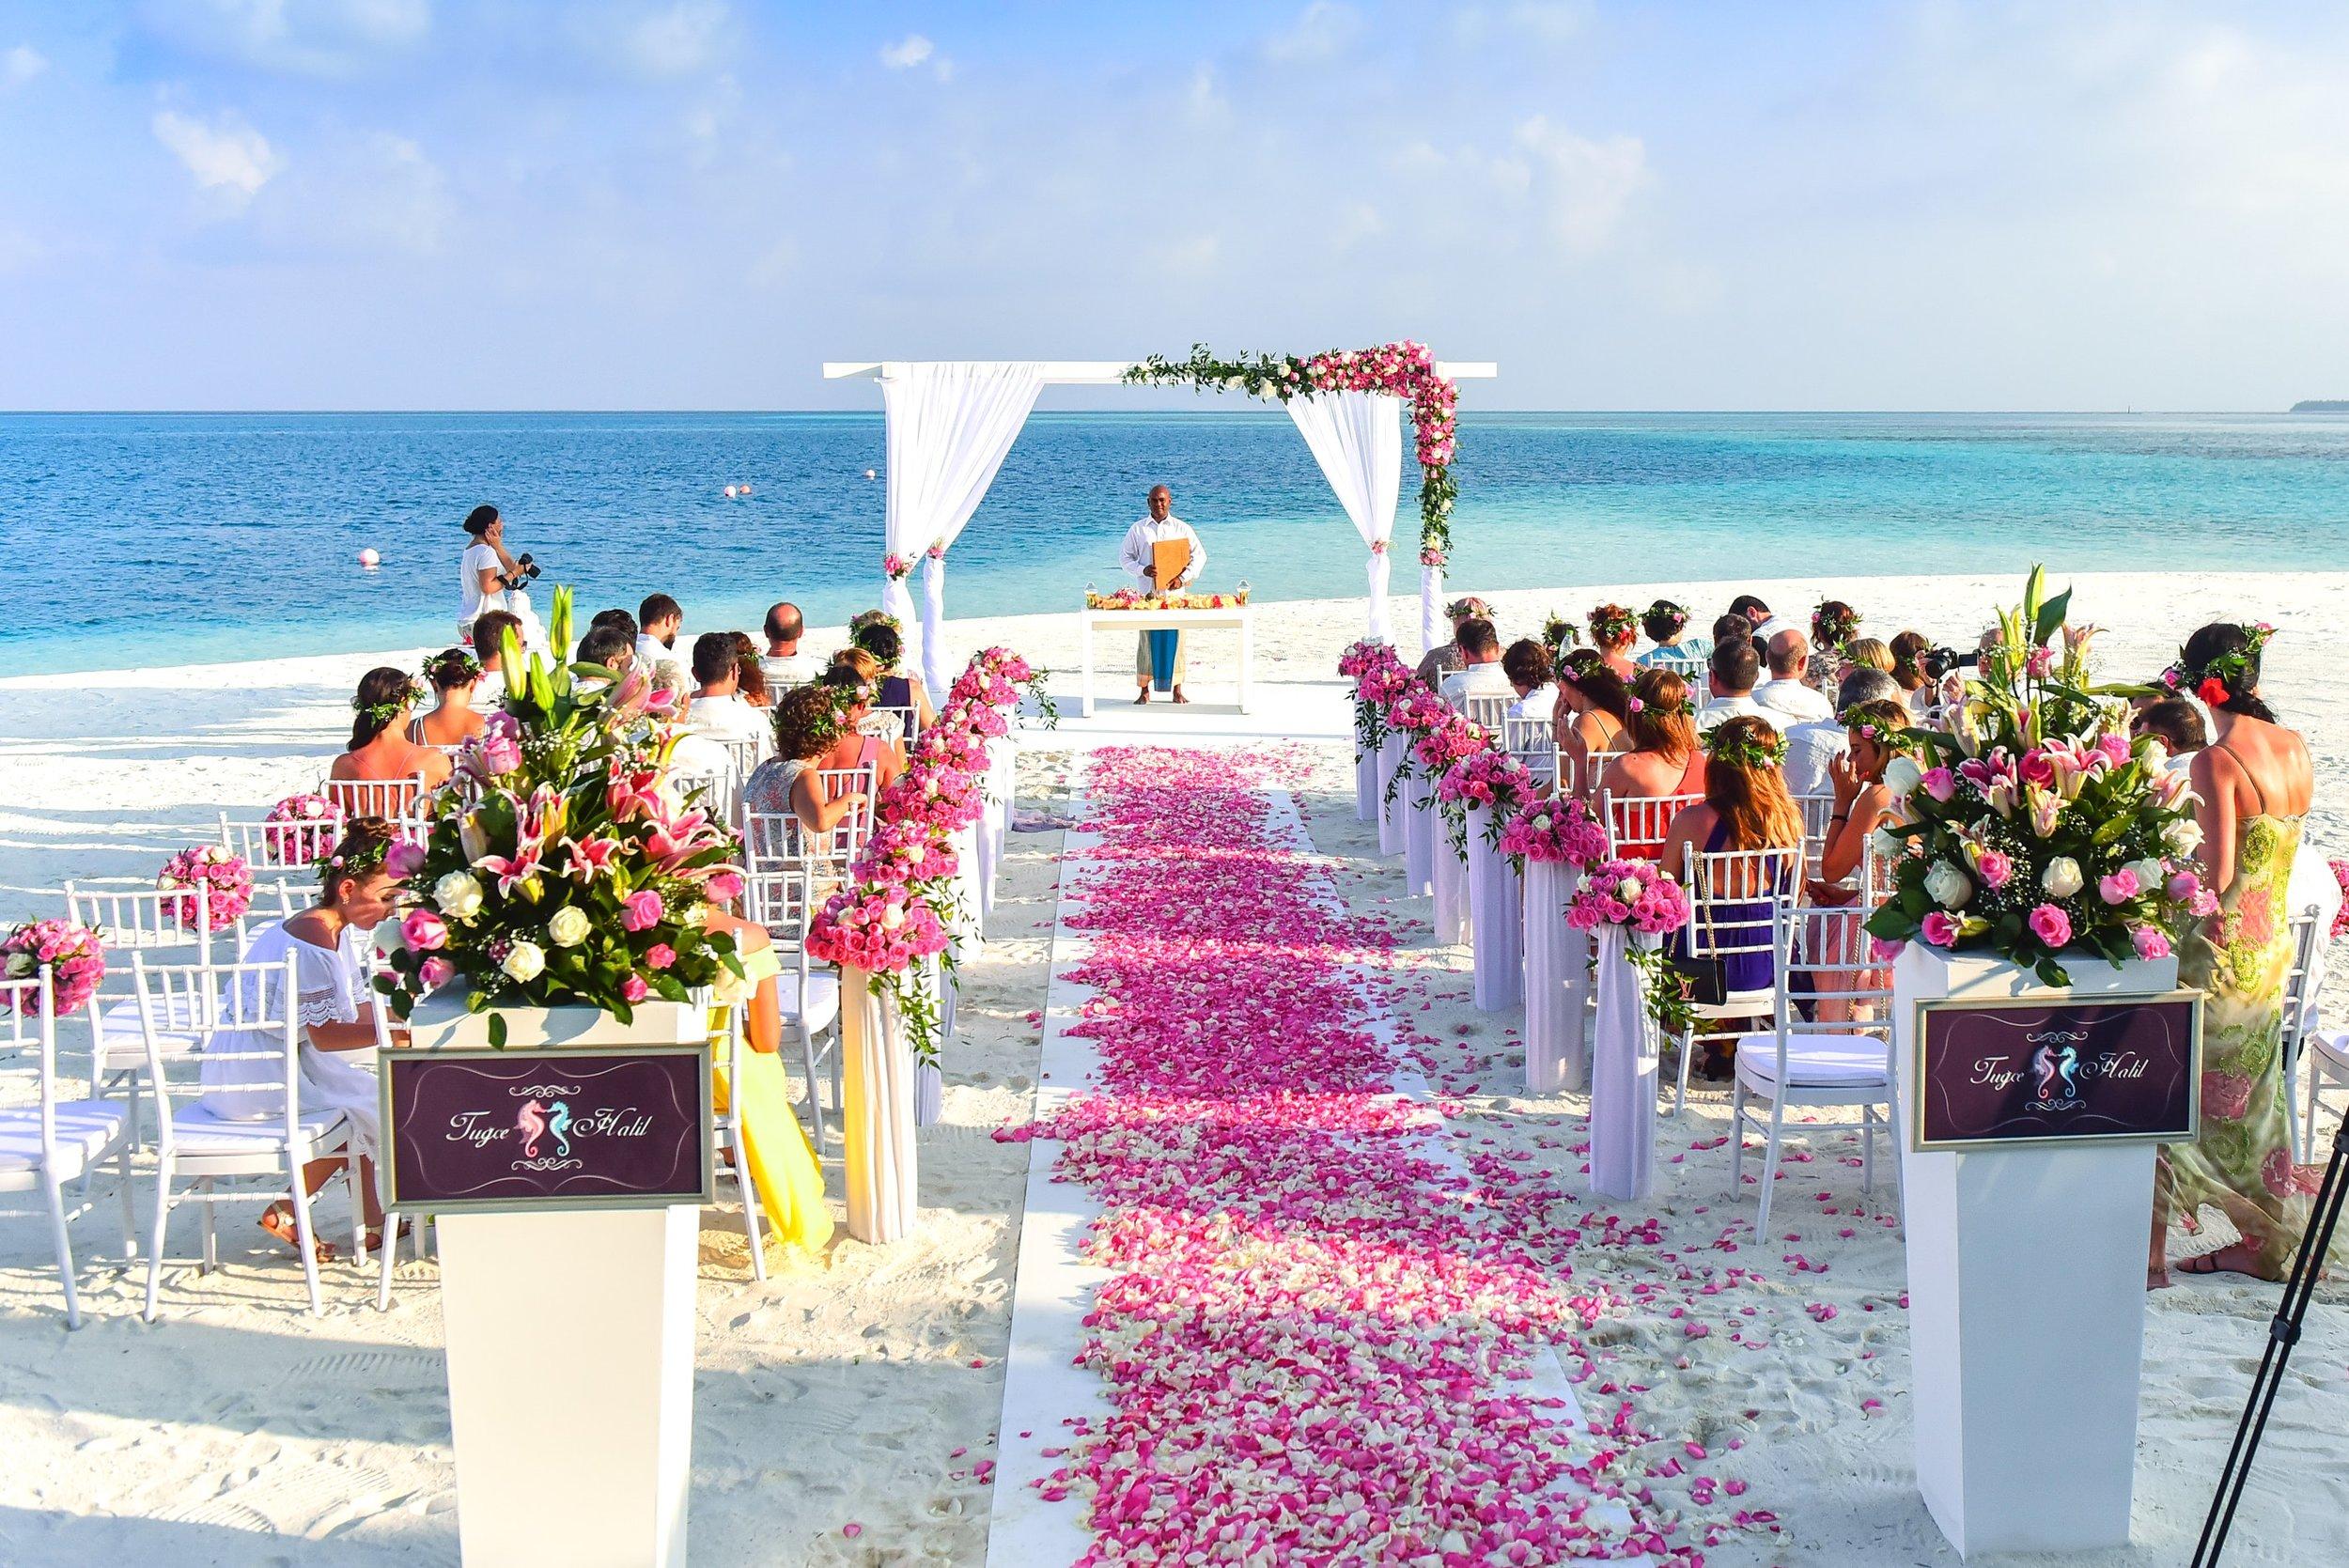 aisle-beach-celebration-169198.jpg